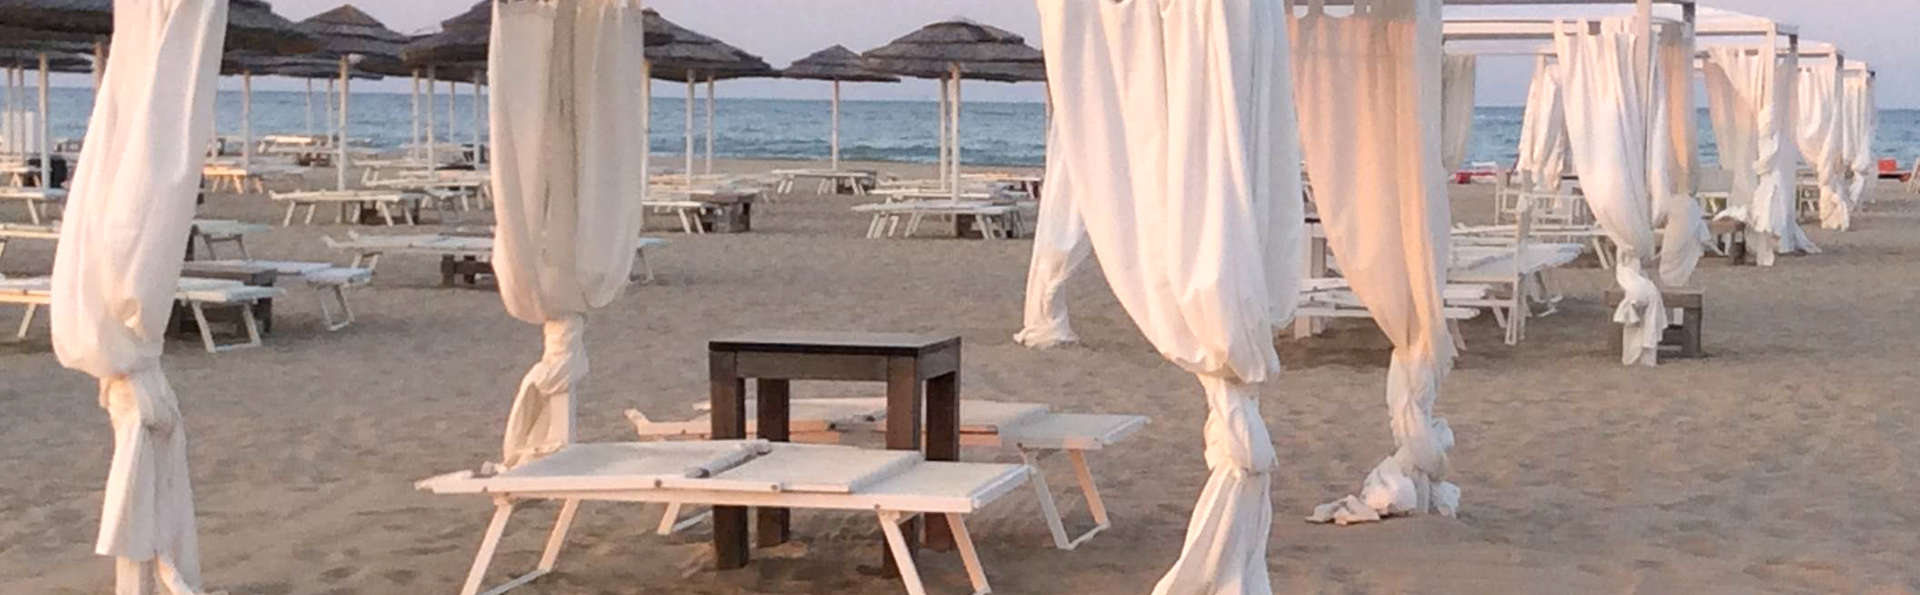 Week end estivo a Rimini con drink di benvenuto